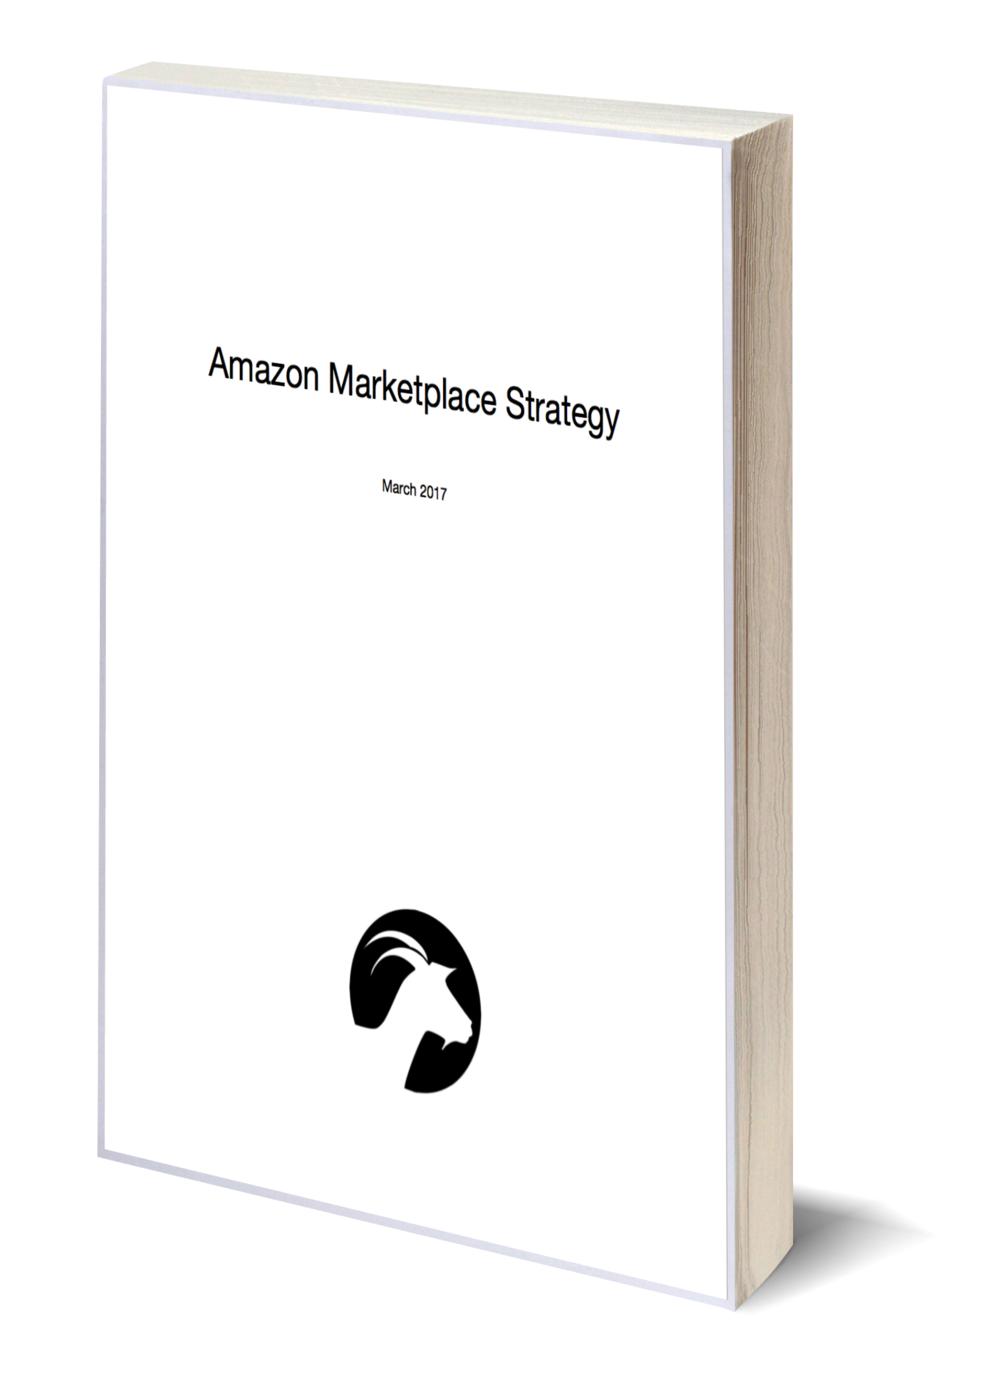 Amazon Marketplace Strategy